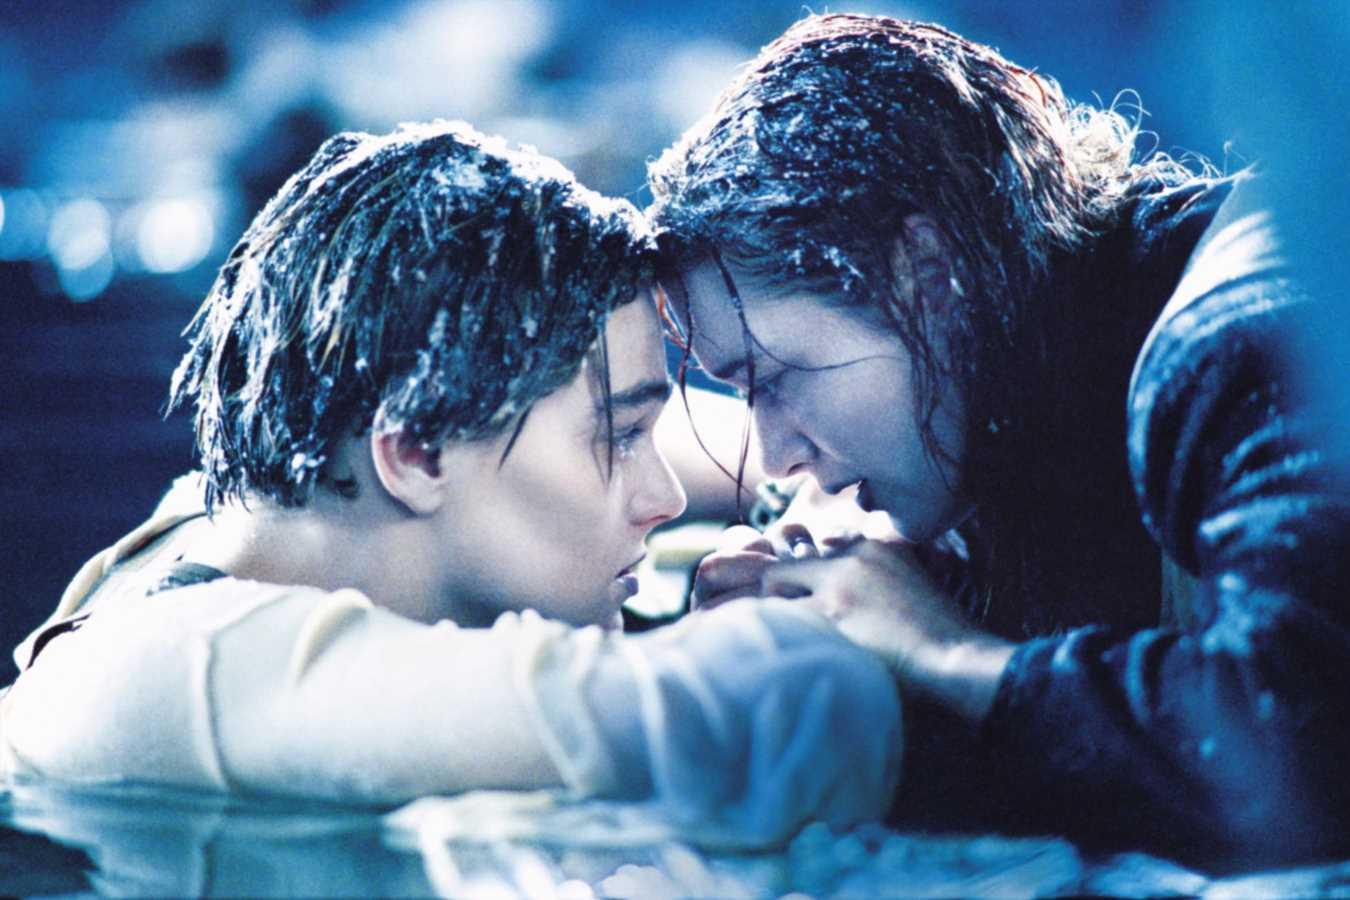 Watch Brad Pitt and Margot Robbie Tease Leonardo DiCaprio About the Titanic Door Controversy